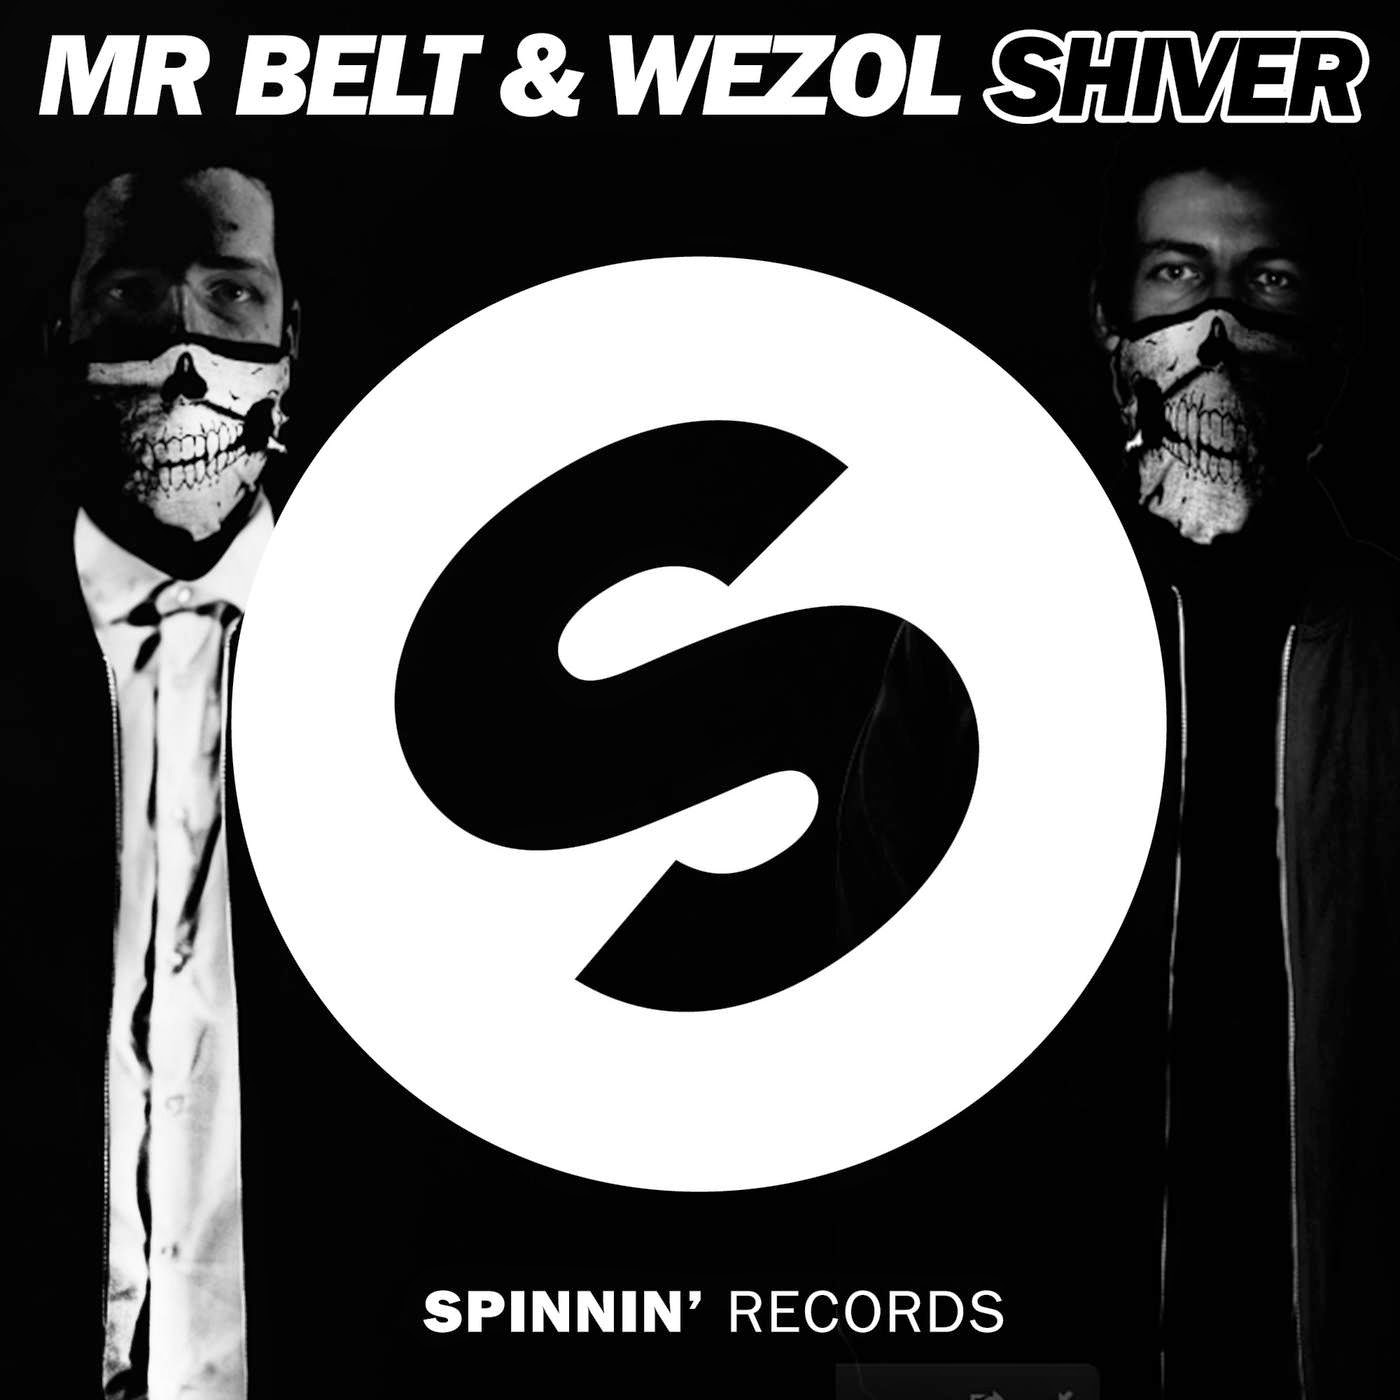 Mr. Belt & Wezol - Shiver - Single